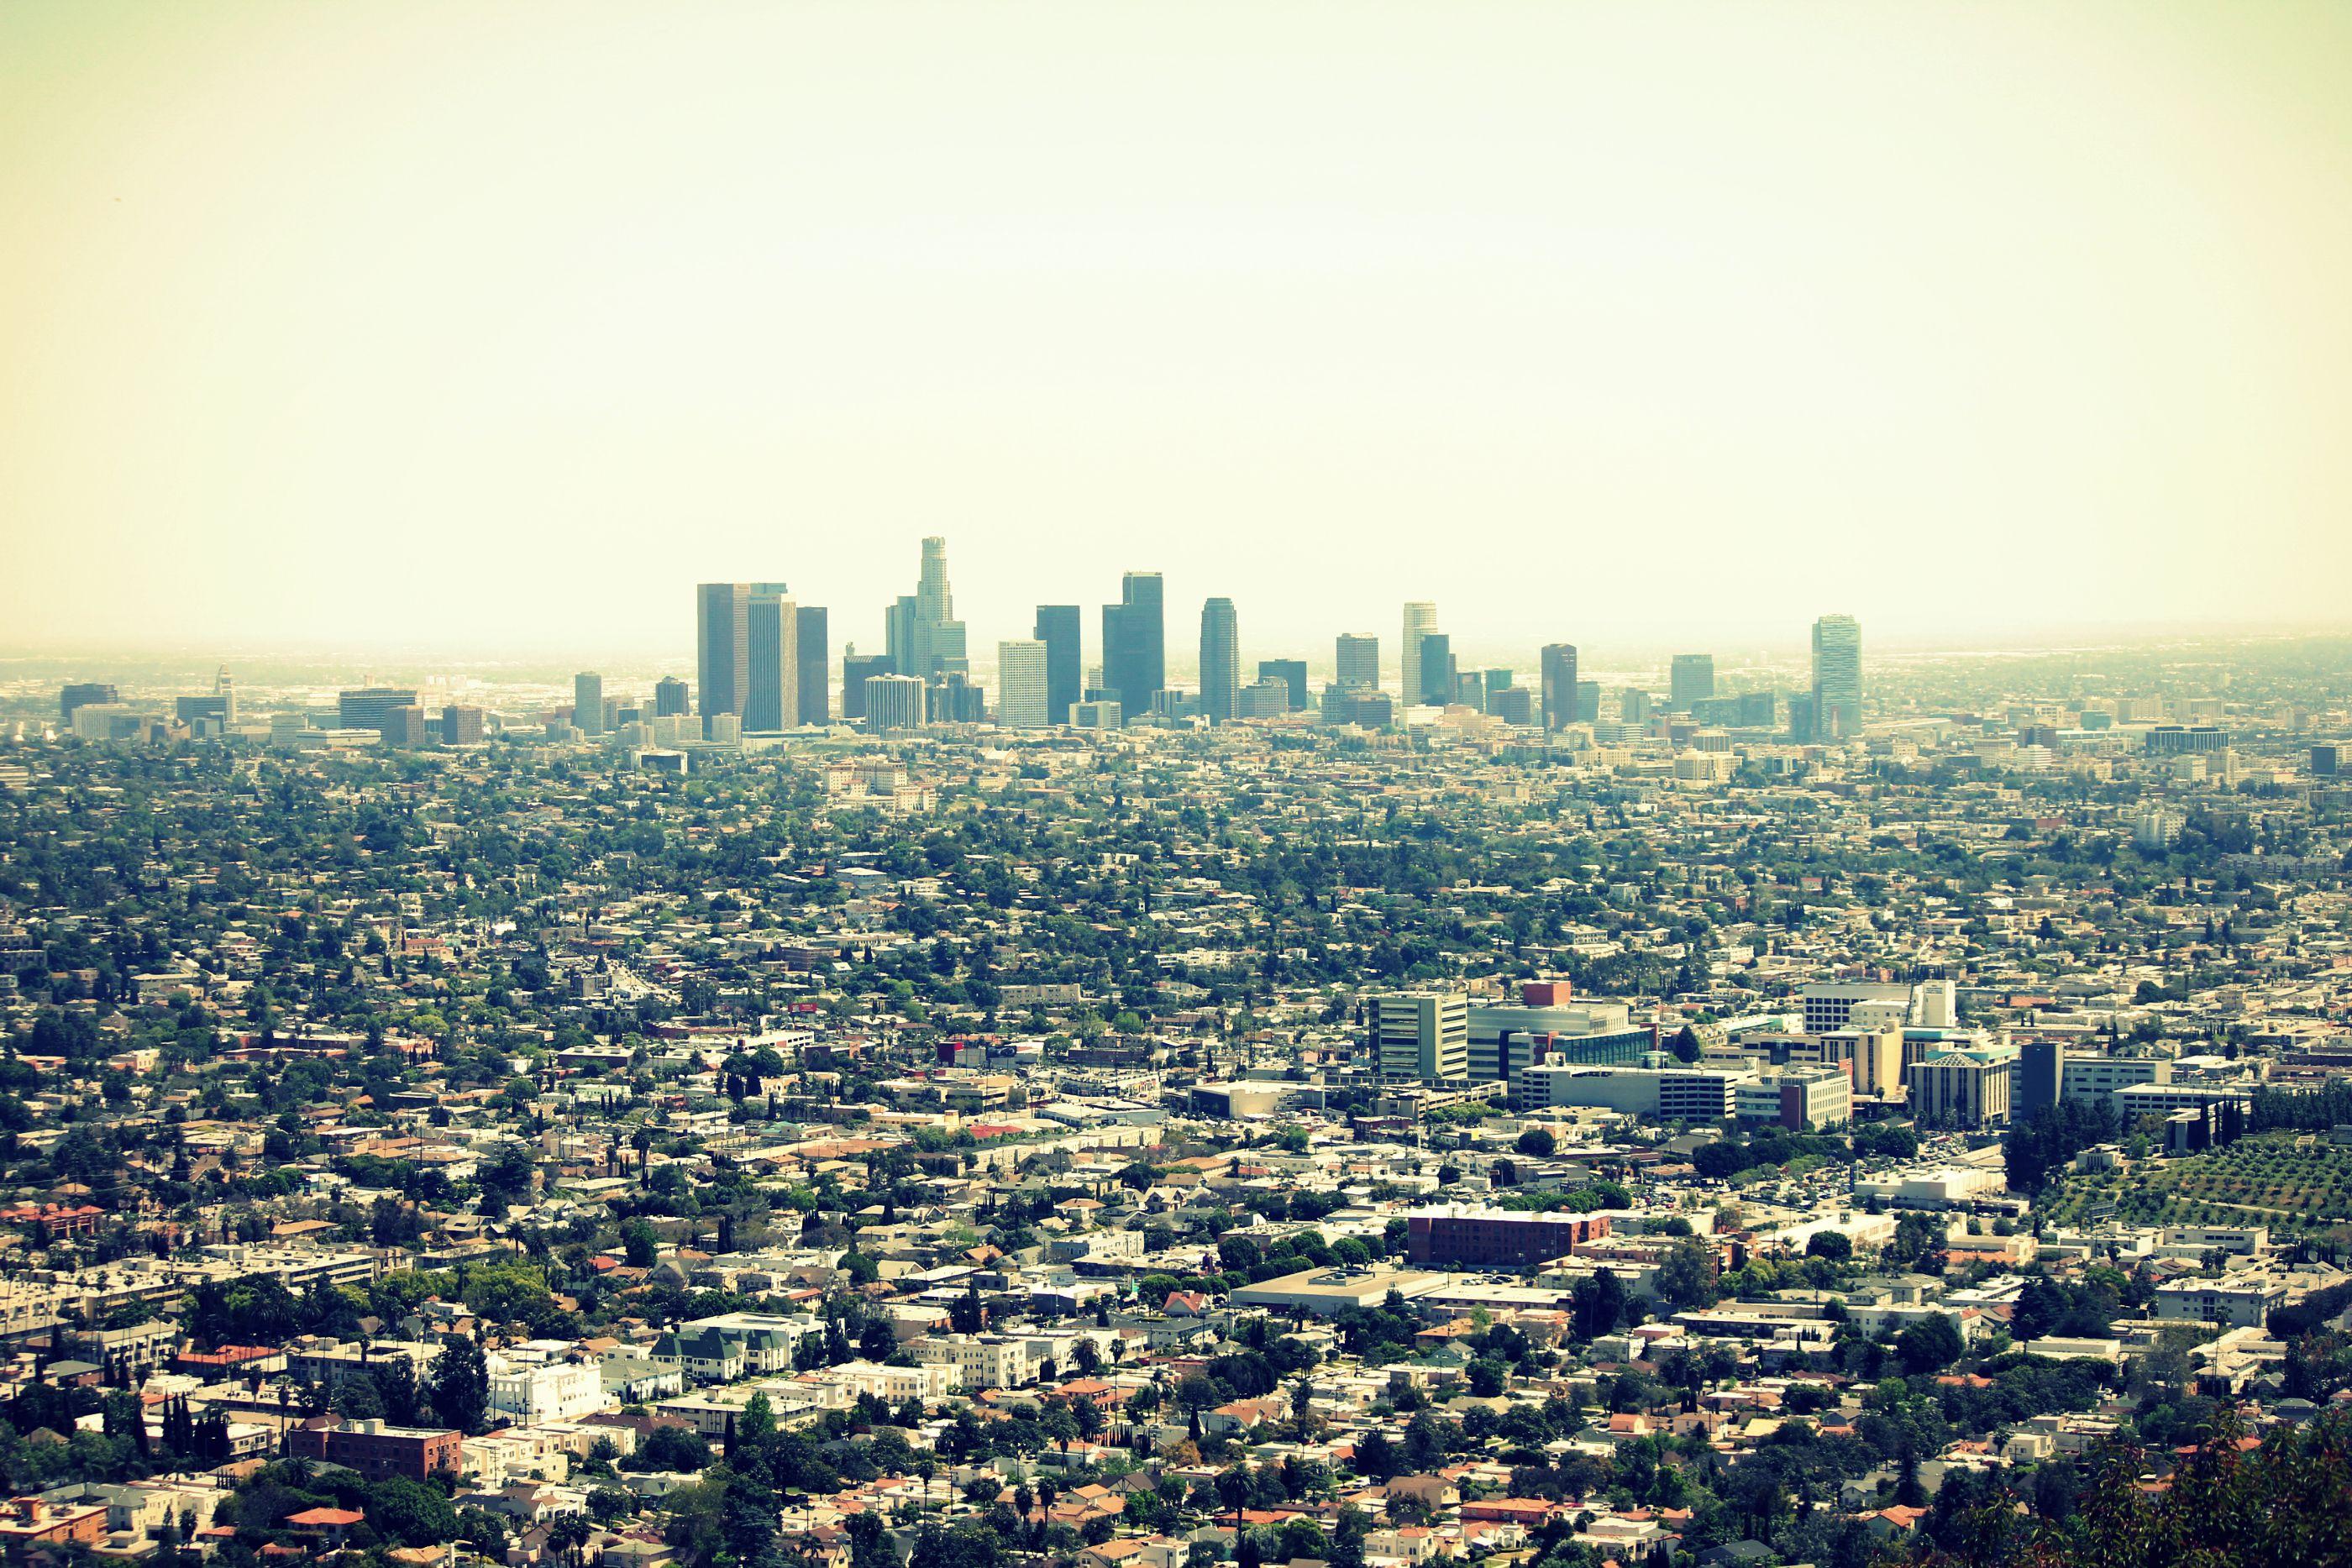 Lalaland California Wallpaper Los Angeles Wallpaper Los Angeles City